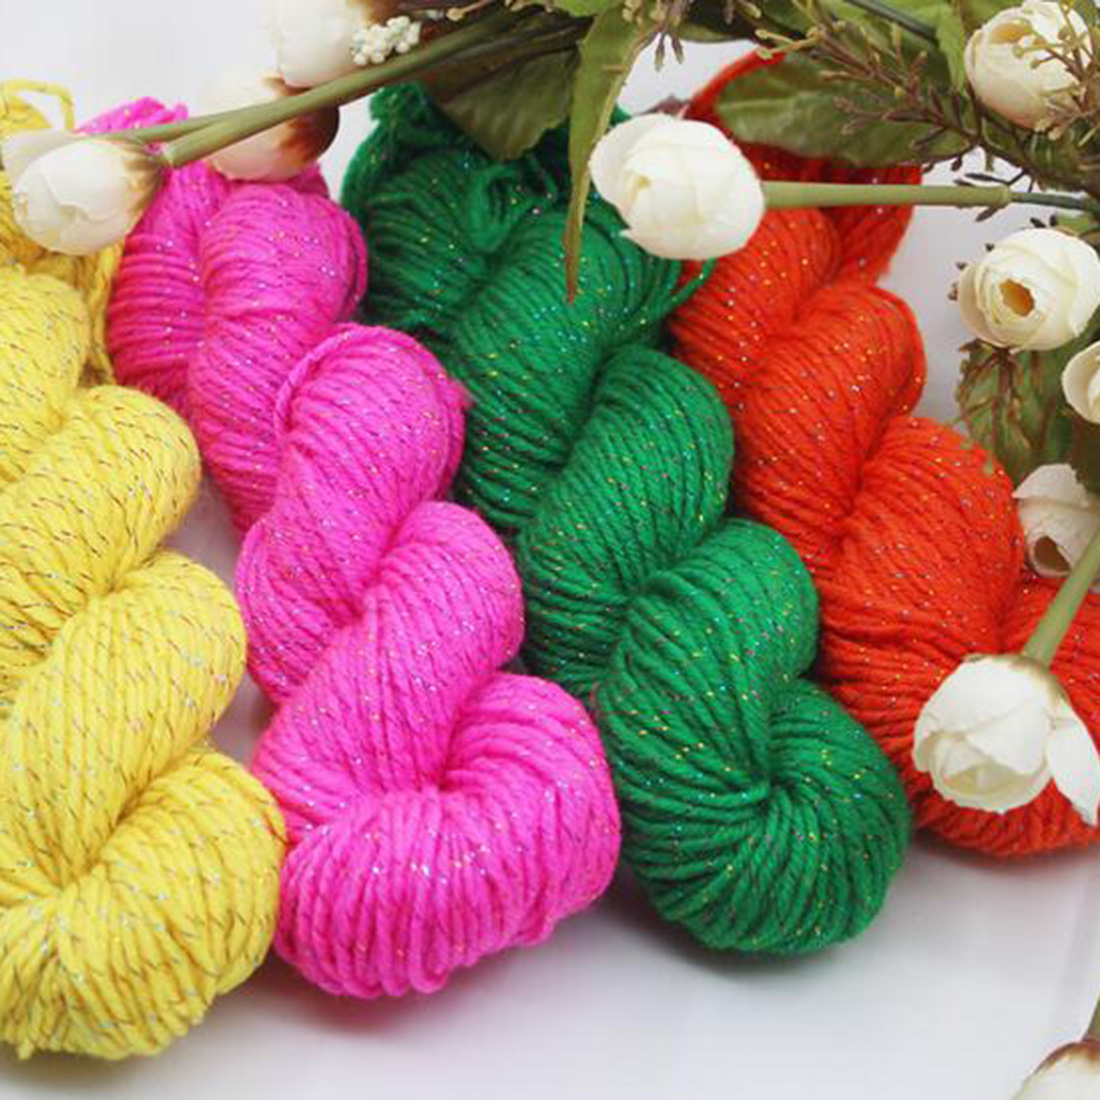 Creative Natural Soft Acrylic Yarn Thick Yarn For Knitting